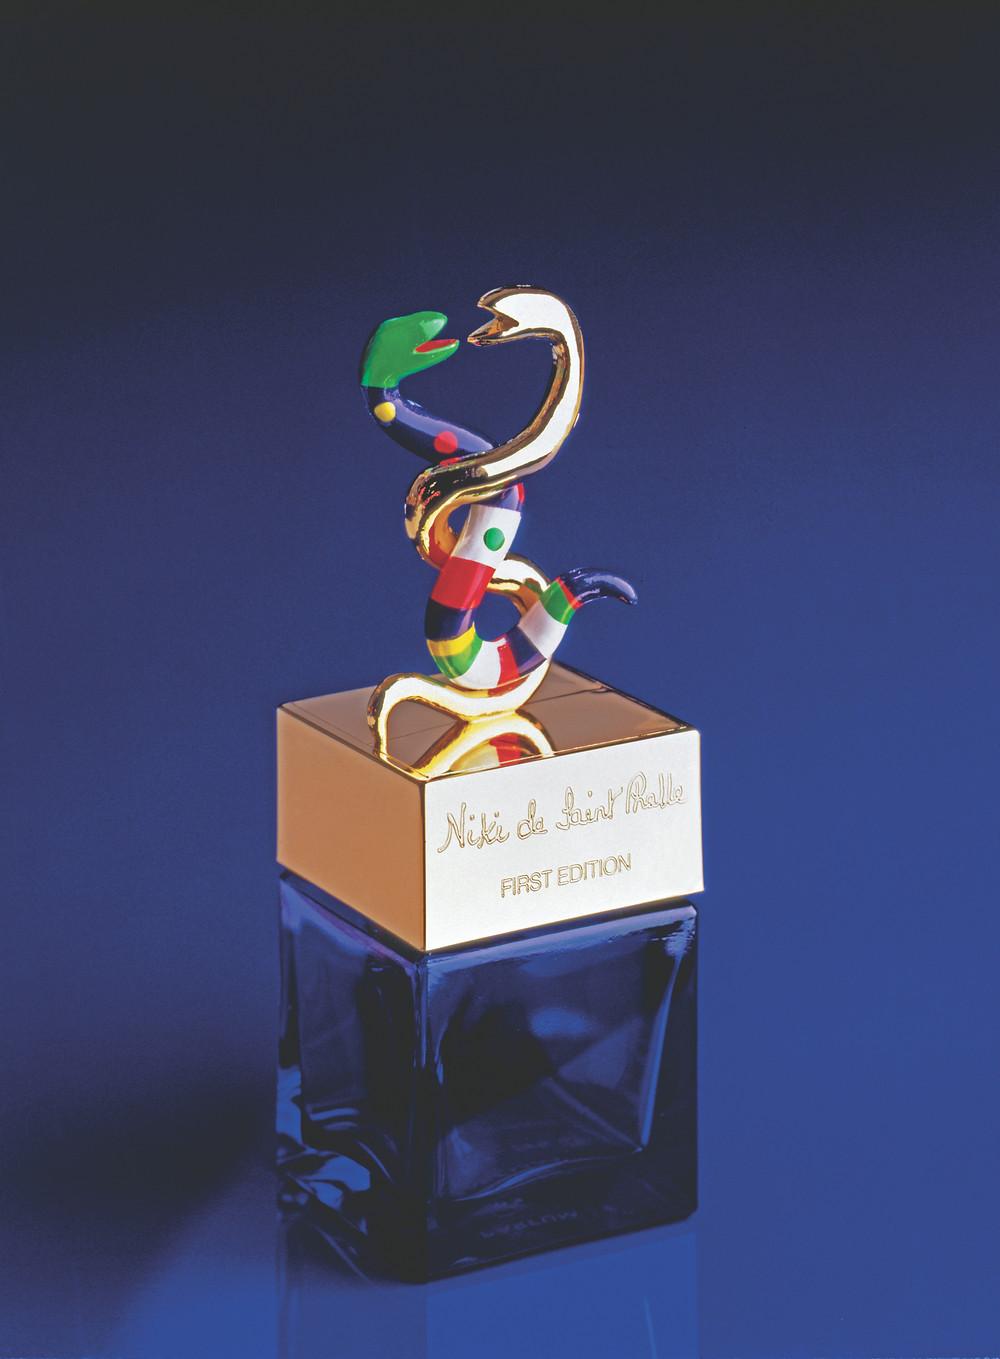 Niki de Saint Phalle. Flaçon de parfum. 1982. © 2021 Niki Charitable Art Foundation